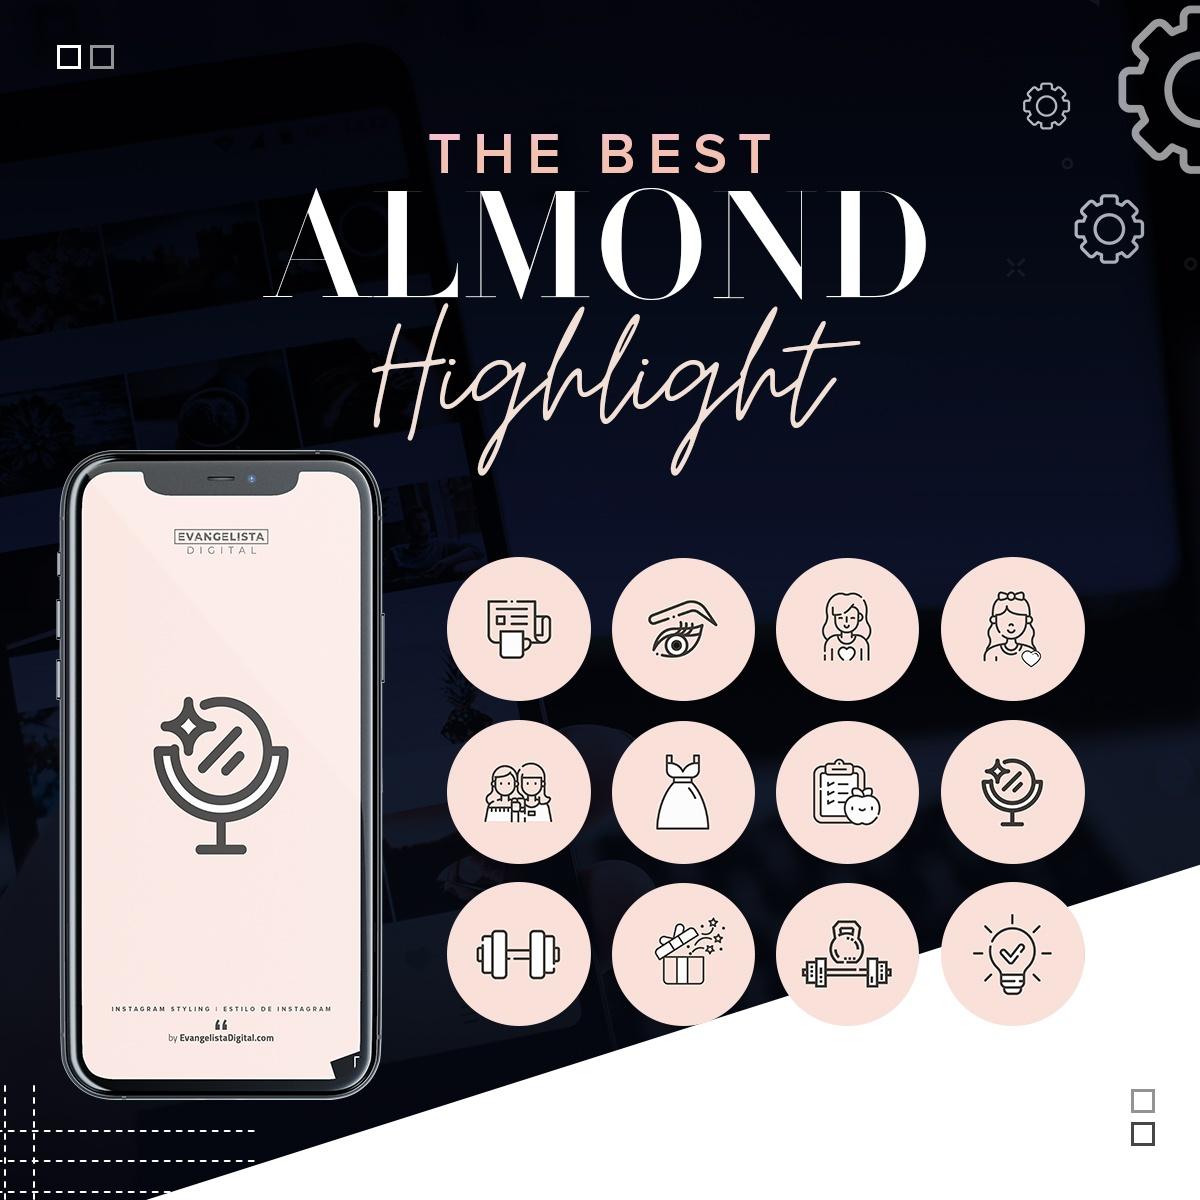 Iconos destacados de Instagram Almond Almendra